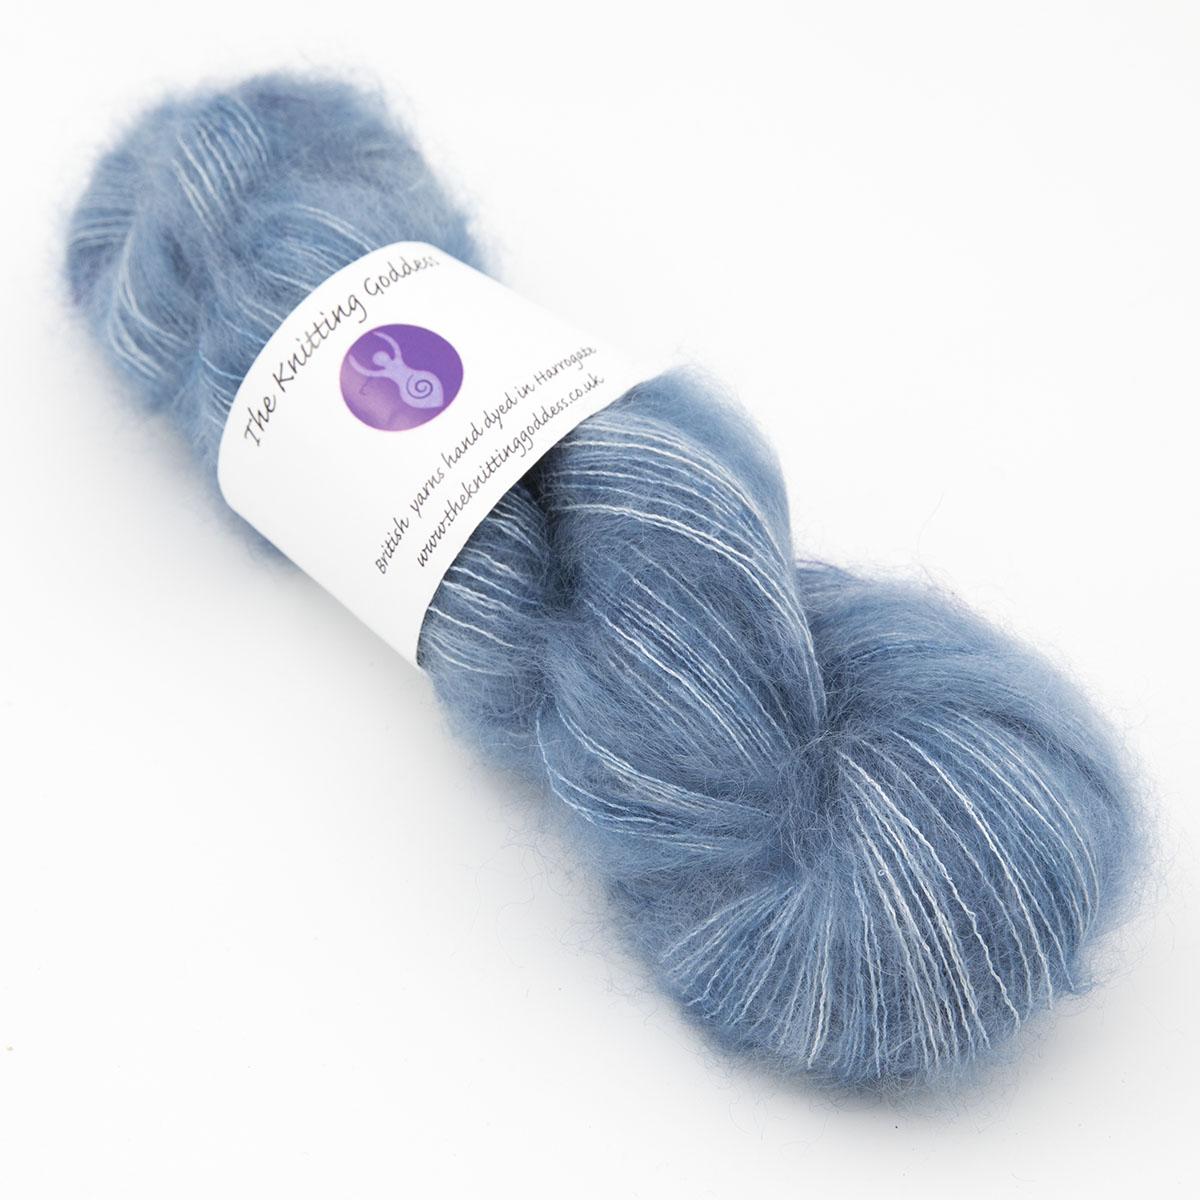 Superhero Genes slate blue colourway, skein of fluffy kid mohair and silk laceweight yarn